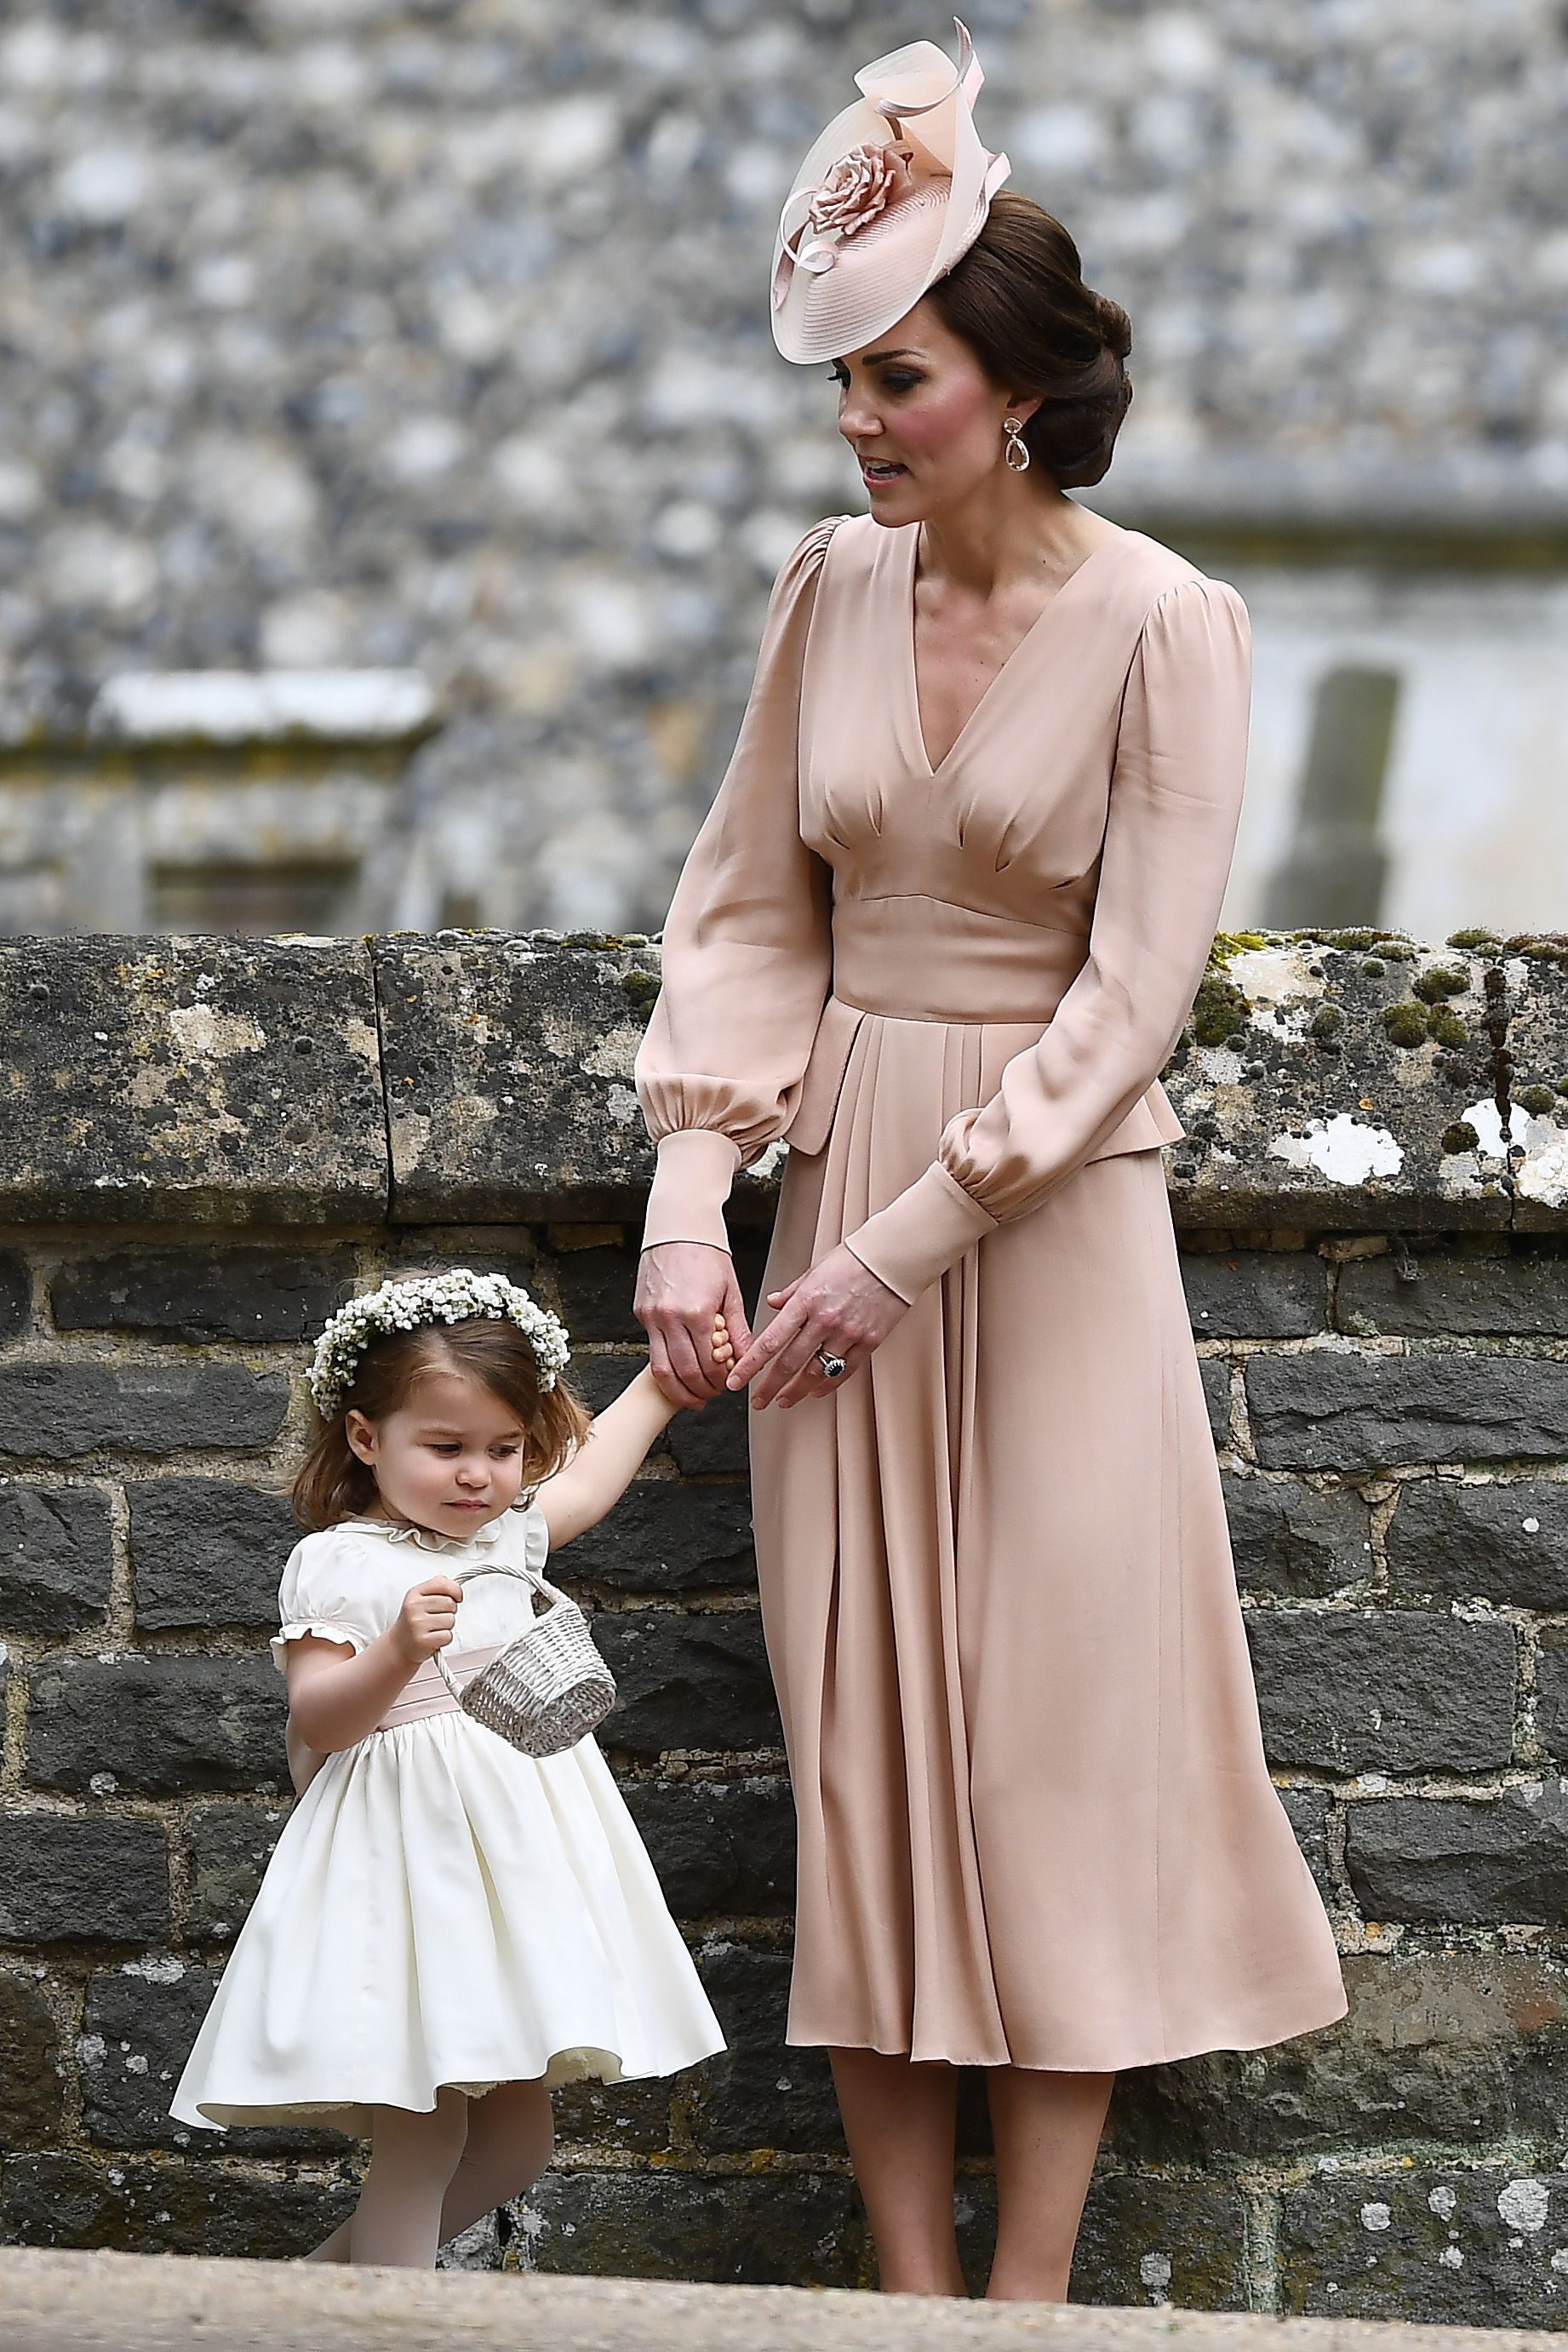 Kate middleton wore a blush dress to pippa 39 s wedding and for Pippa middleton wedding dress buy